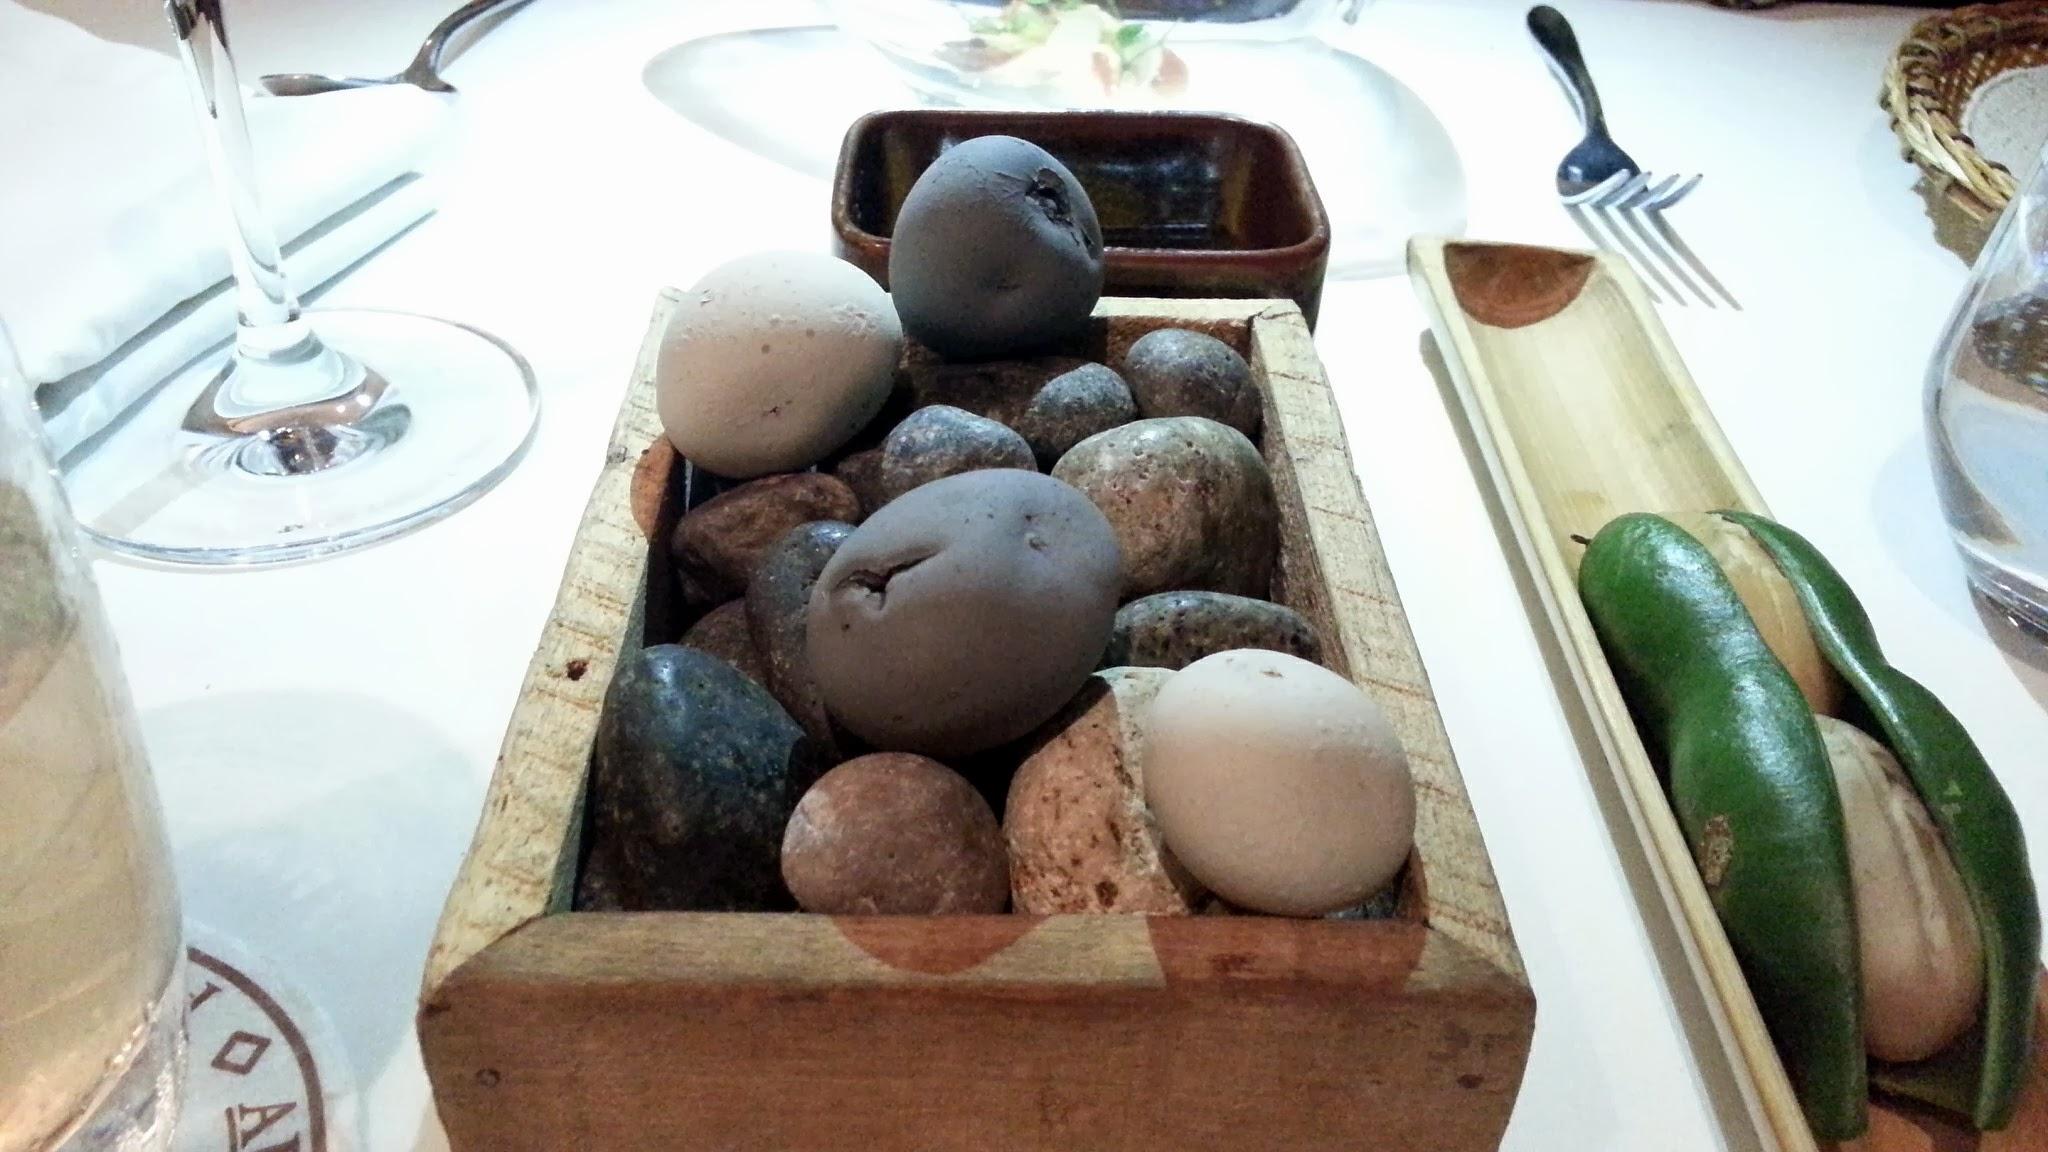 Restaurante Malabar - Piedras de patata